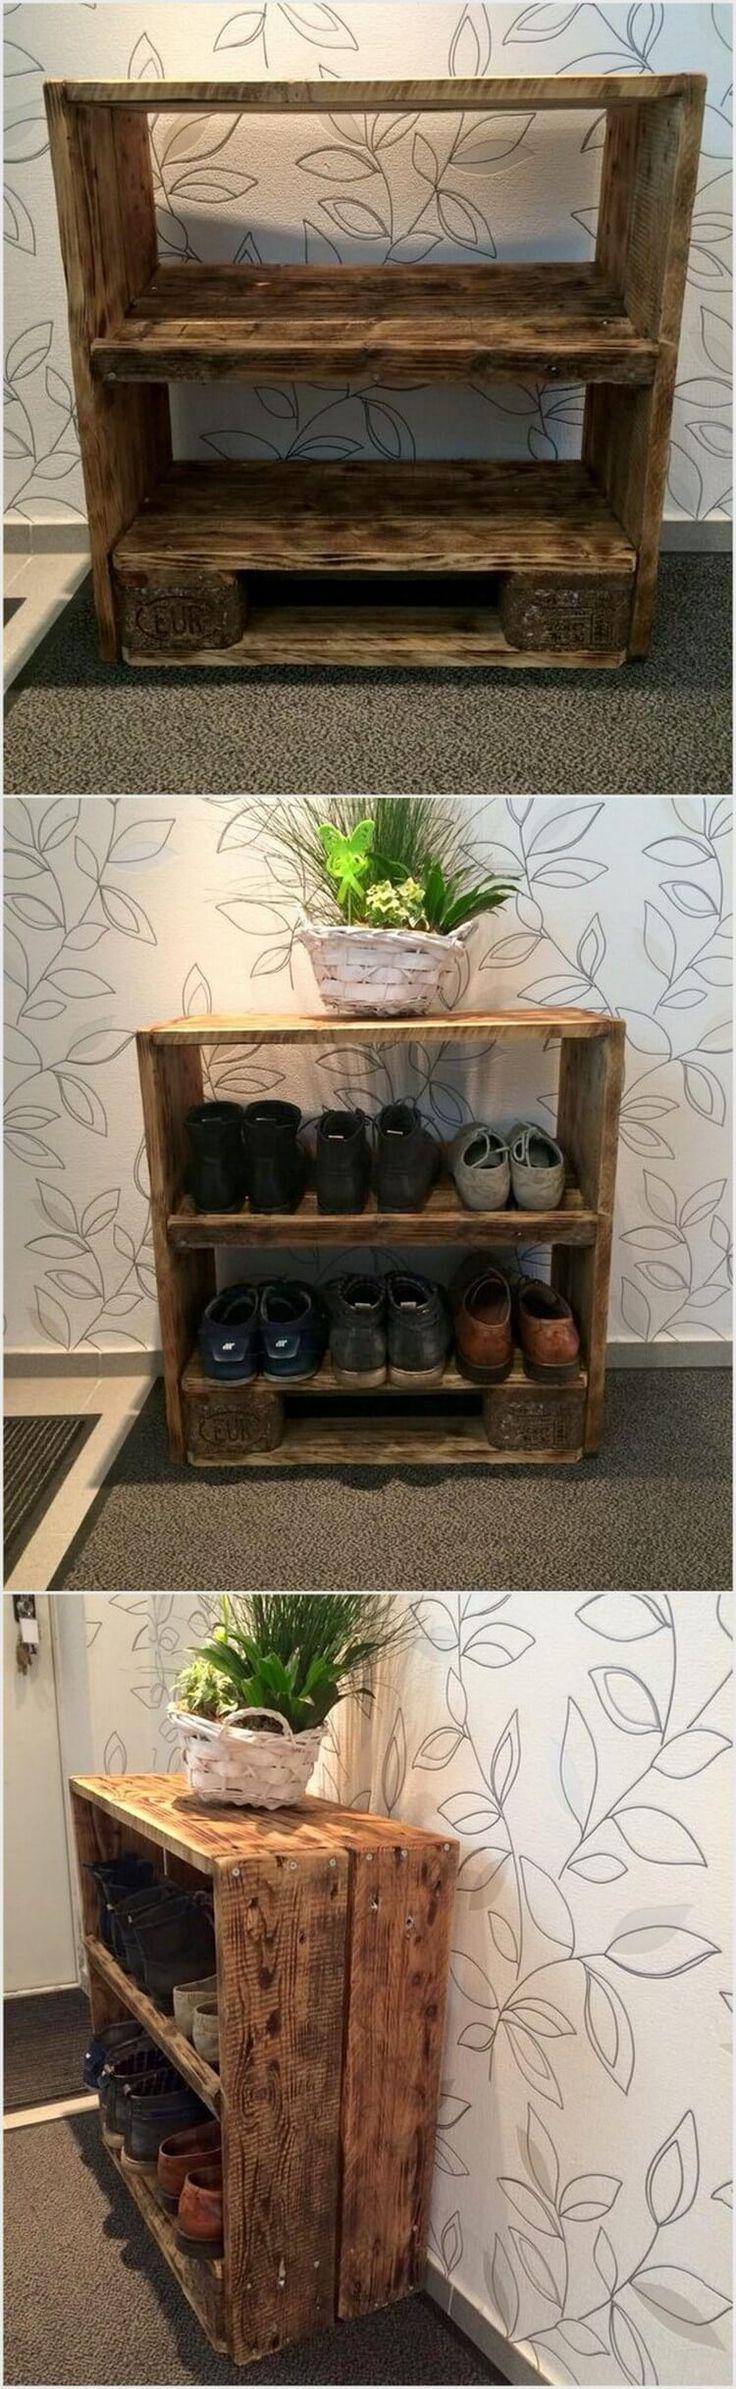 Shipping Wood Pallet Shoe Rack